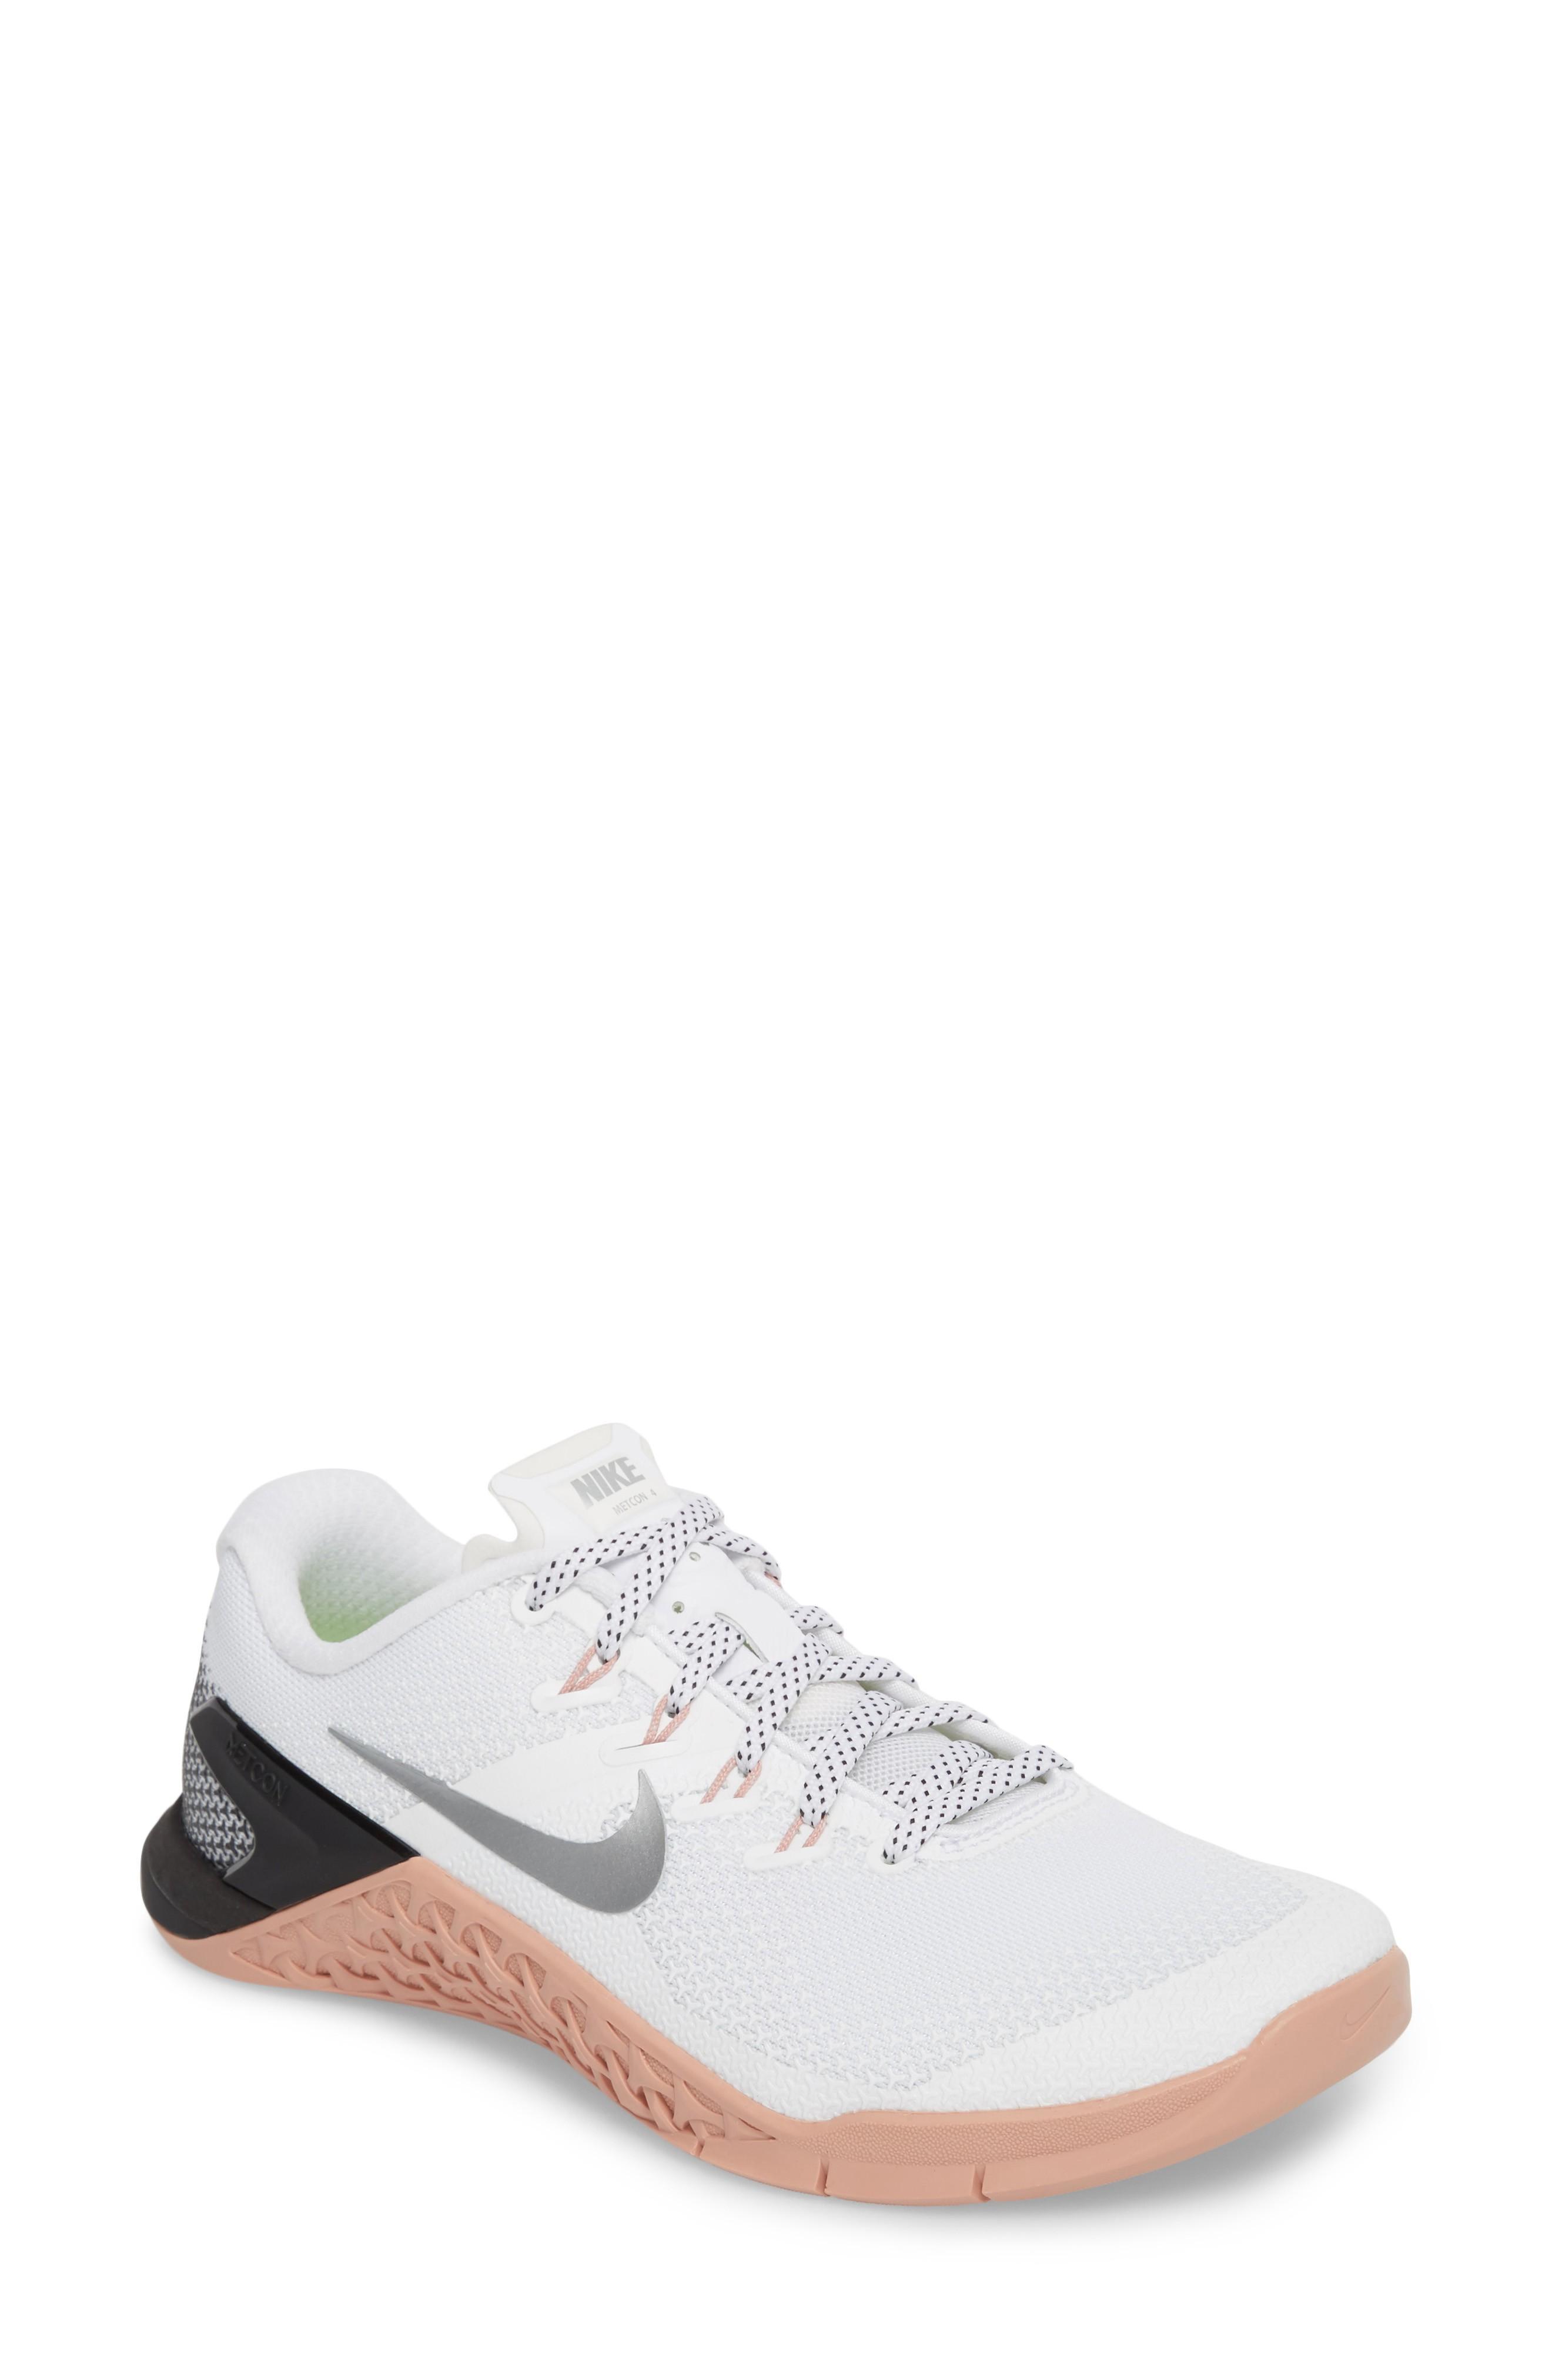 size 40 dd495 529aa Nike Metcon 4 Training Shoe In White  Metallic Silver